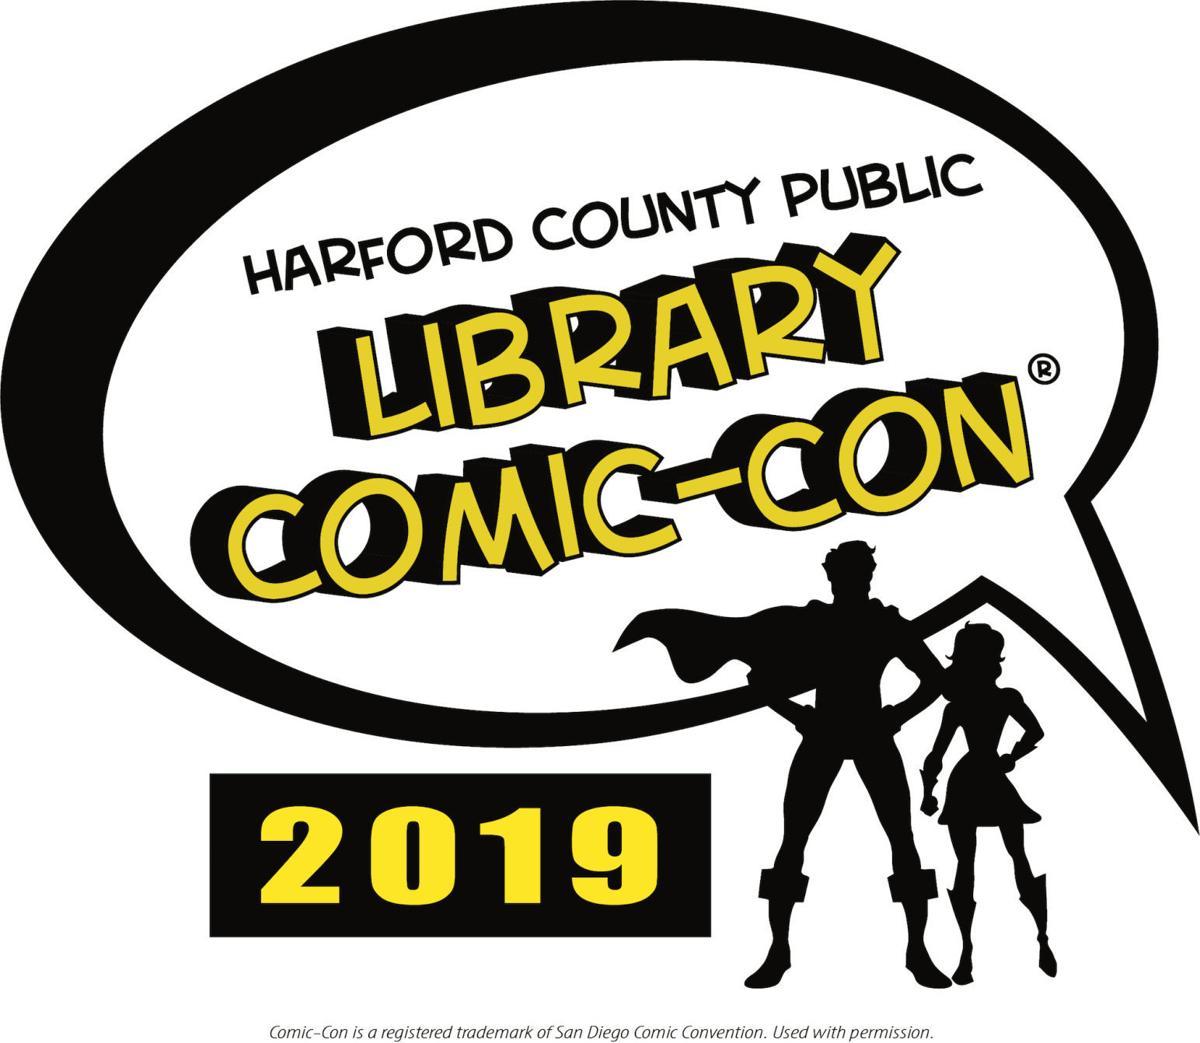 HCPL Comic-Con 2019 logo